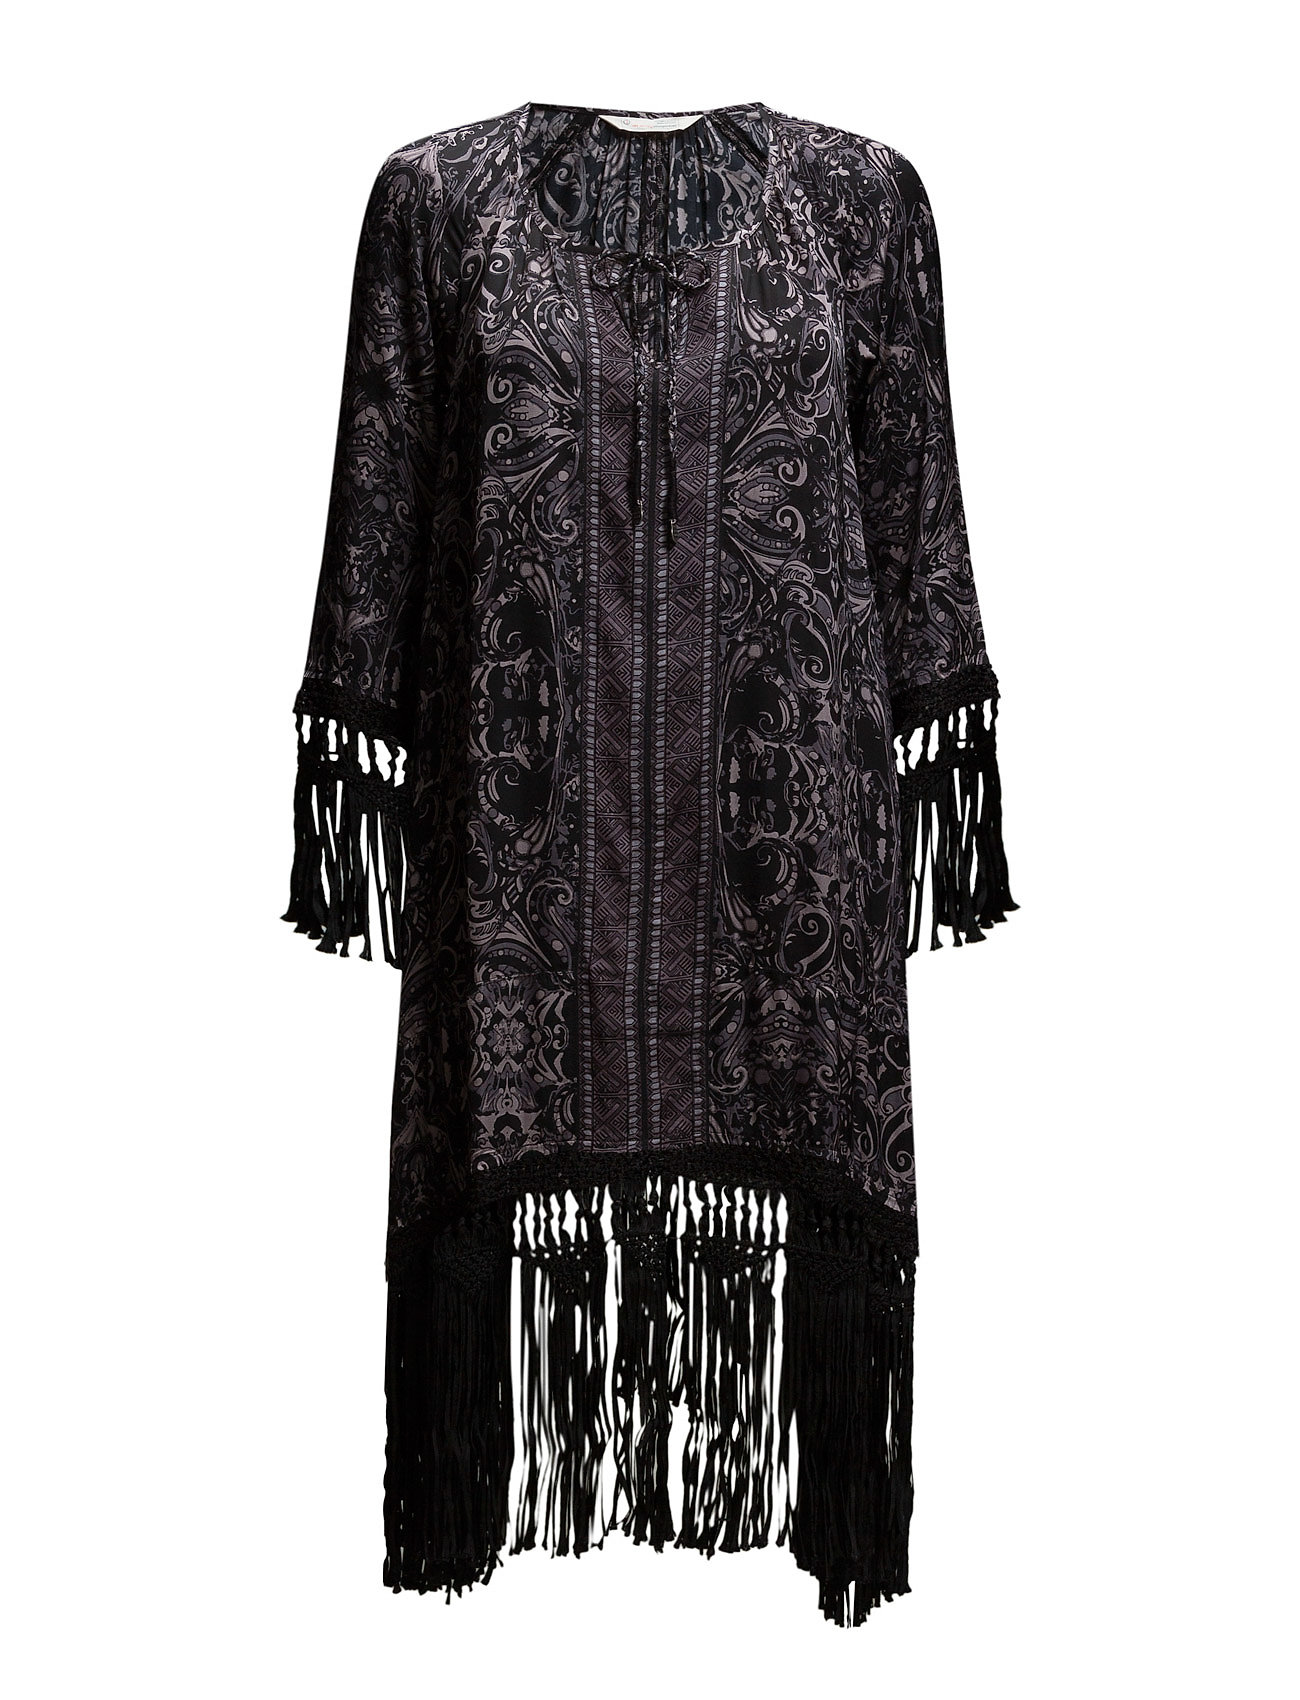 ODD MOLLY pasadena tunic - ALMOST BLACK